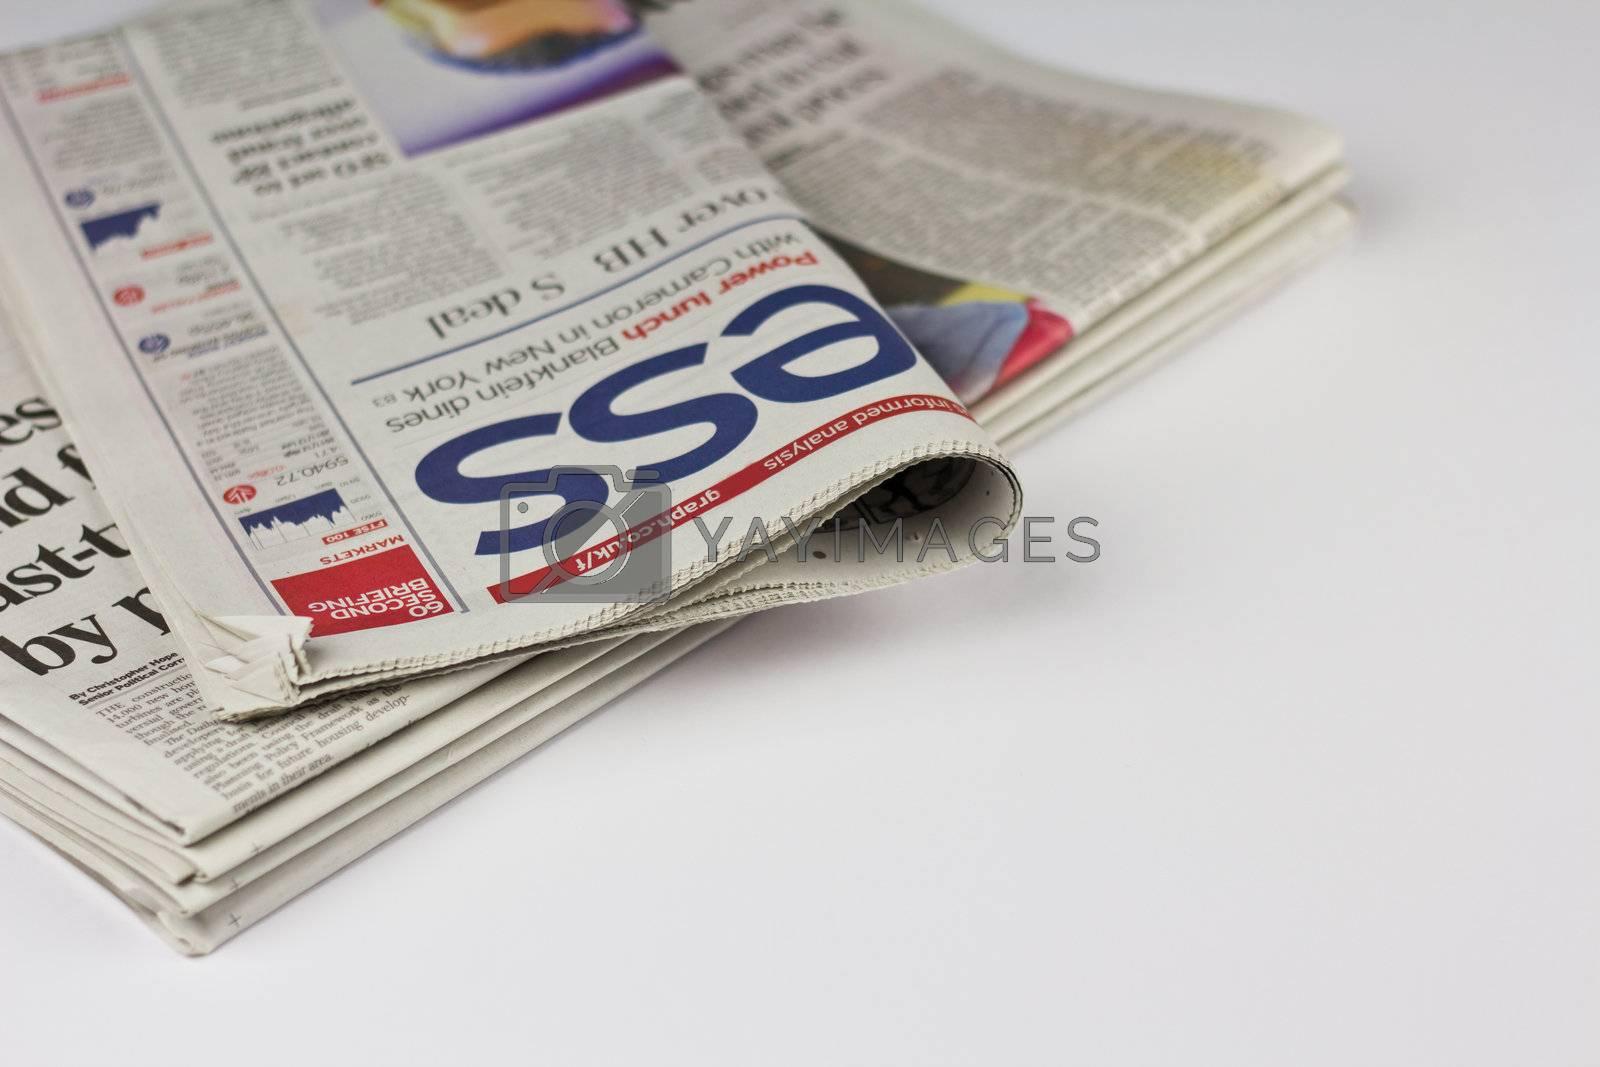 Fianacial and business Newspaper